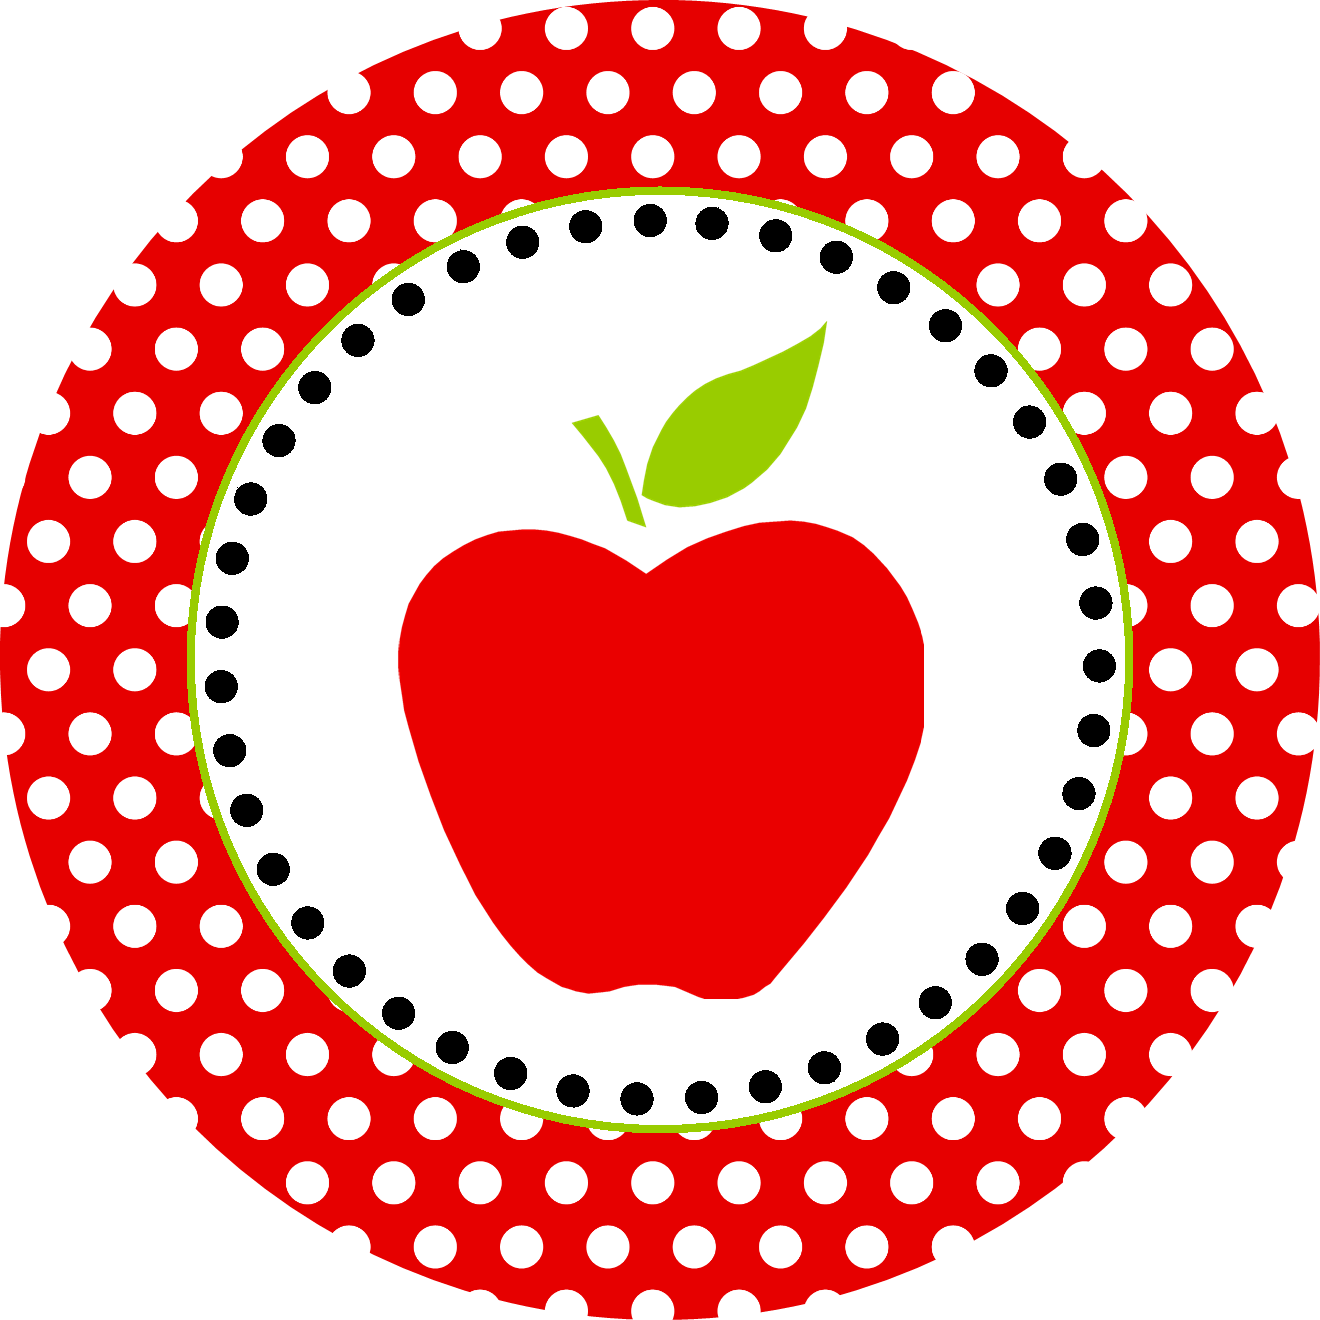 Teacher apple clipart biezumd.